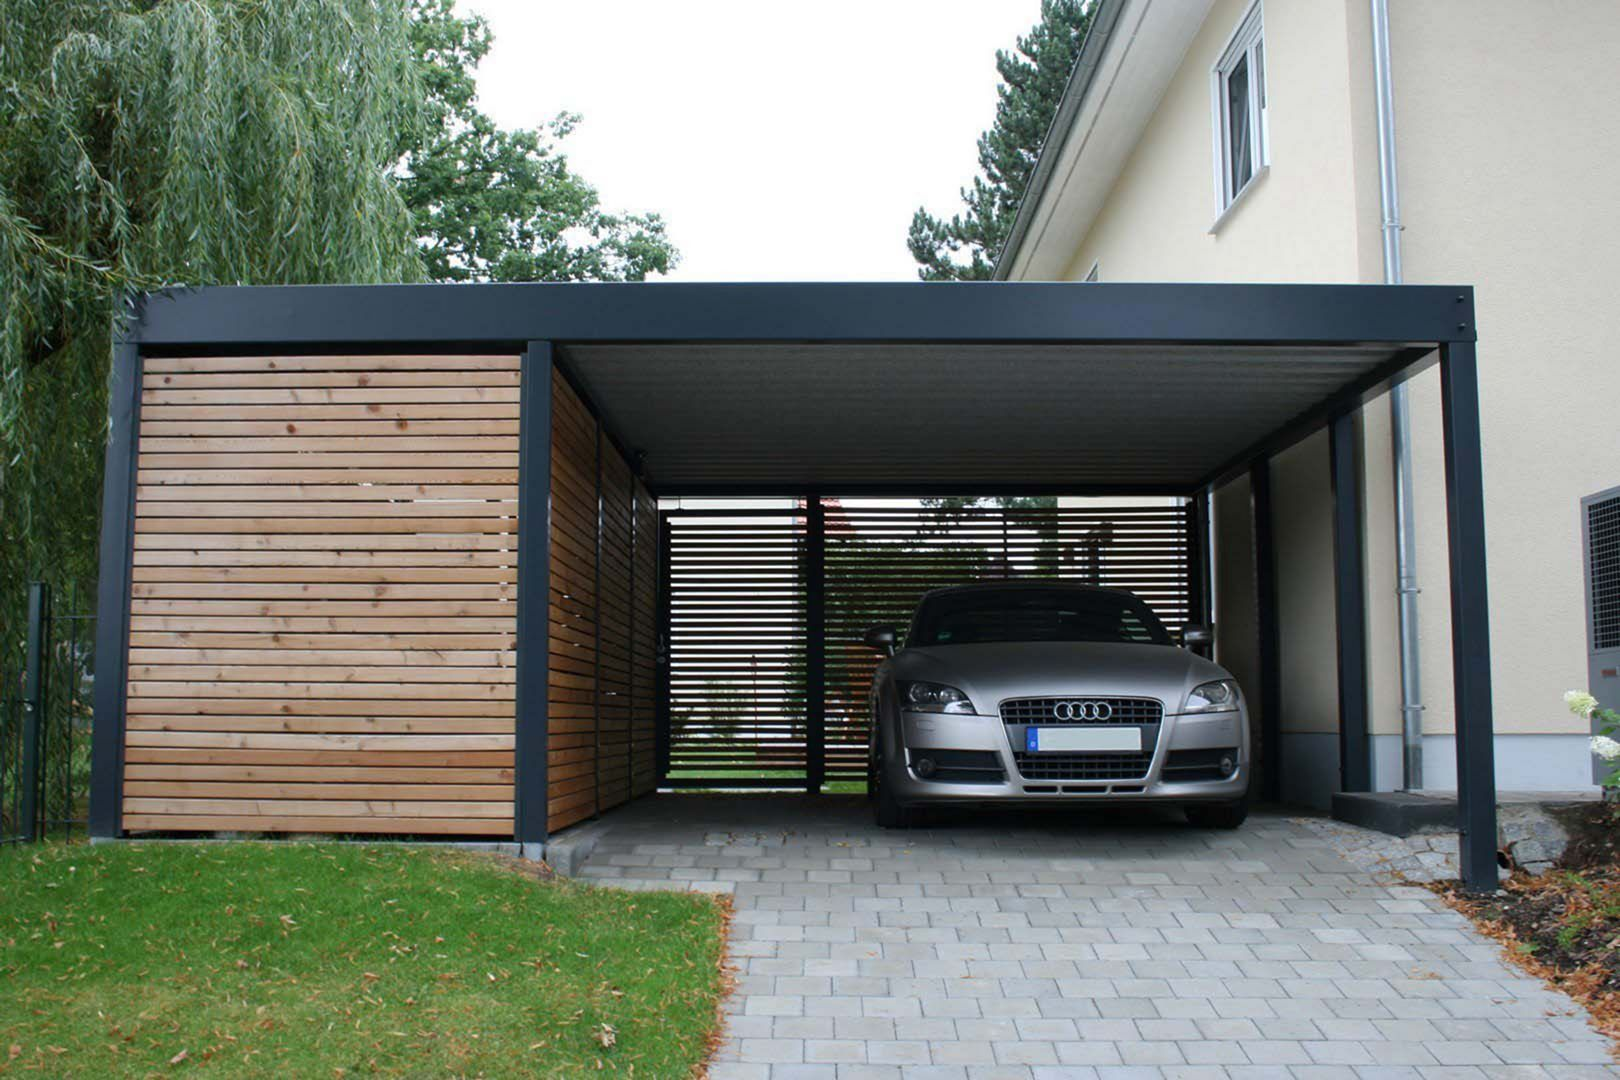 Super Cool And Modern Car Garage Design 8 Carport Designs Garage Design Modern Carport